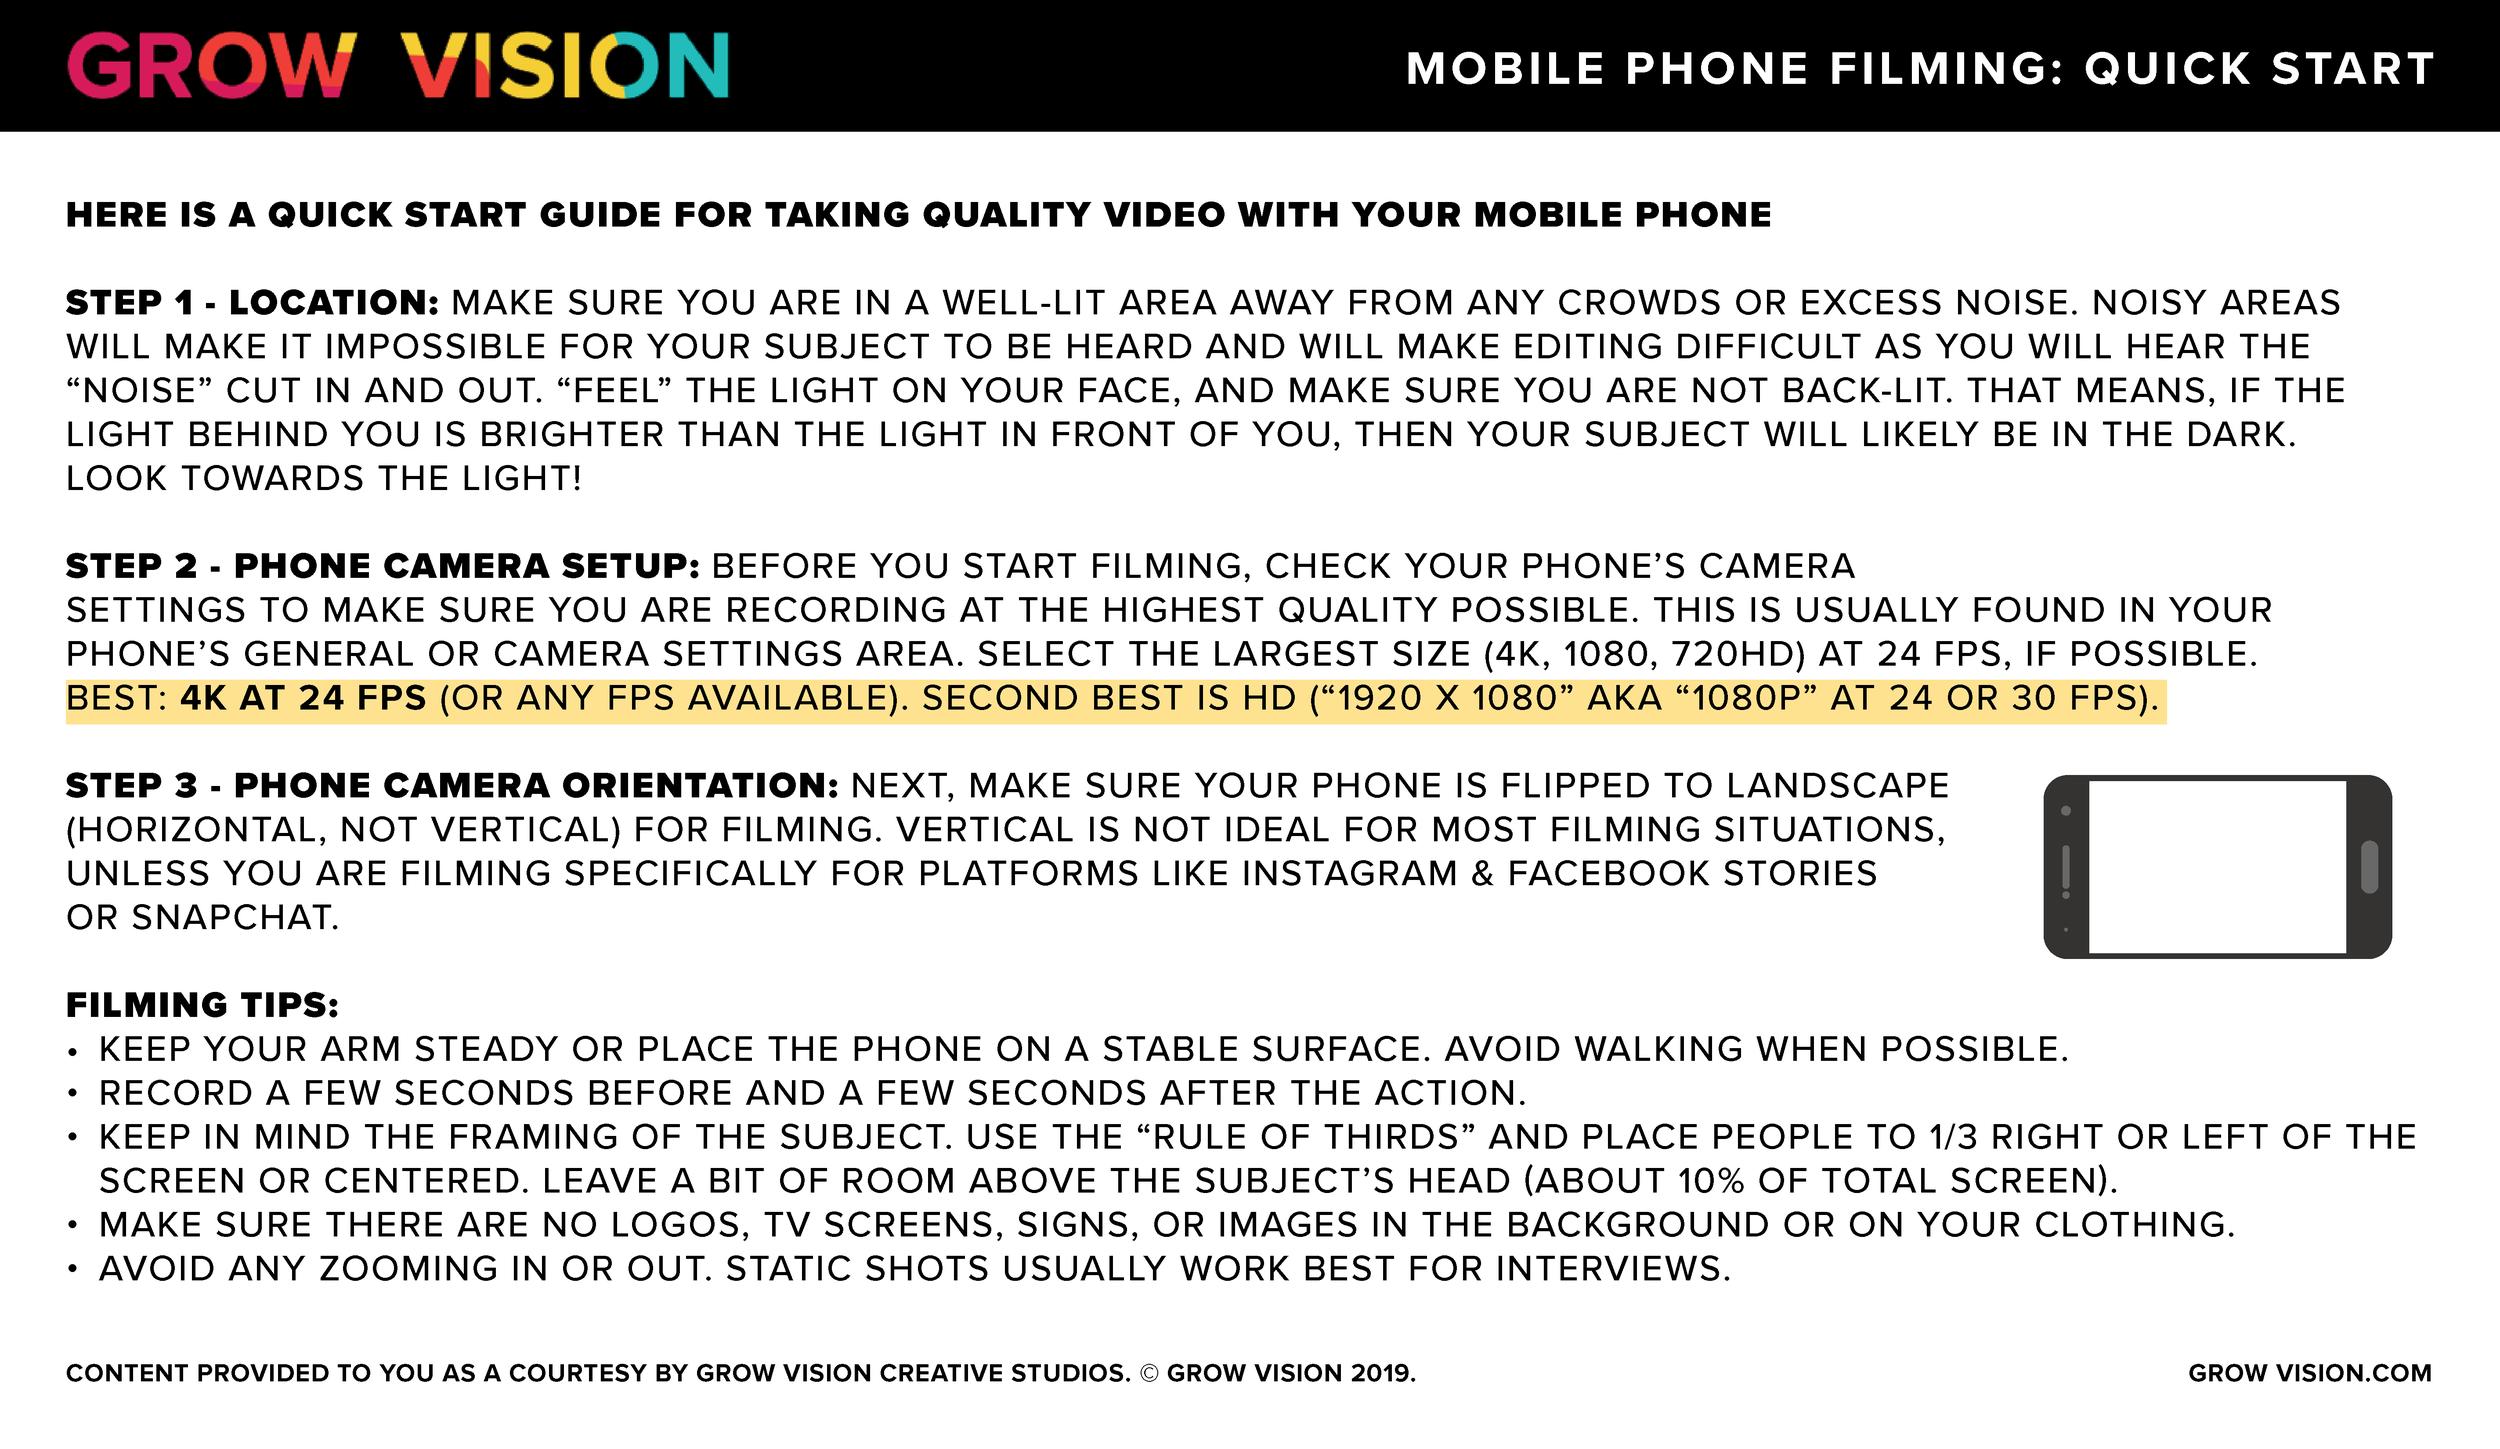 GrowVision_MobilePhoneFilmingQuickStart2019.png